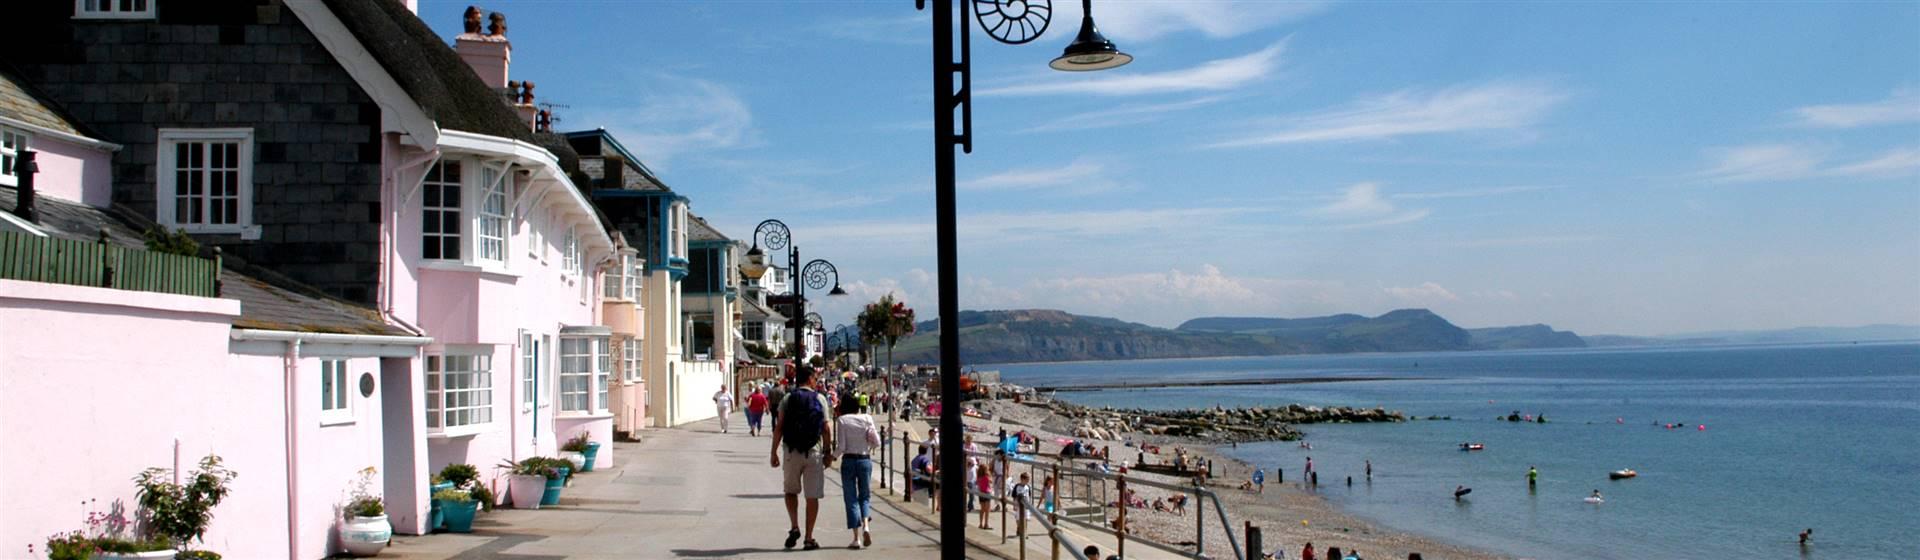 Lyme Regis & Seaton